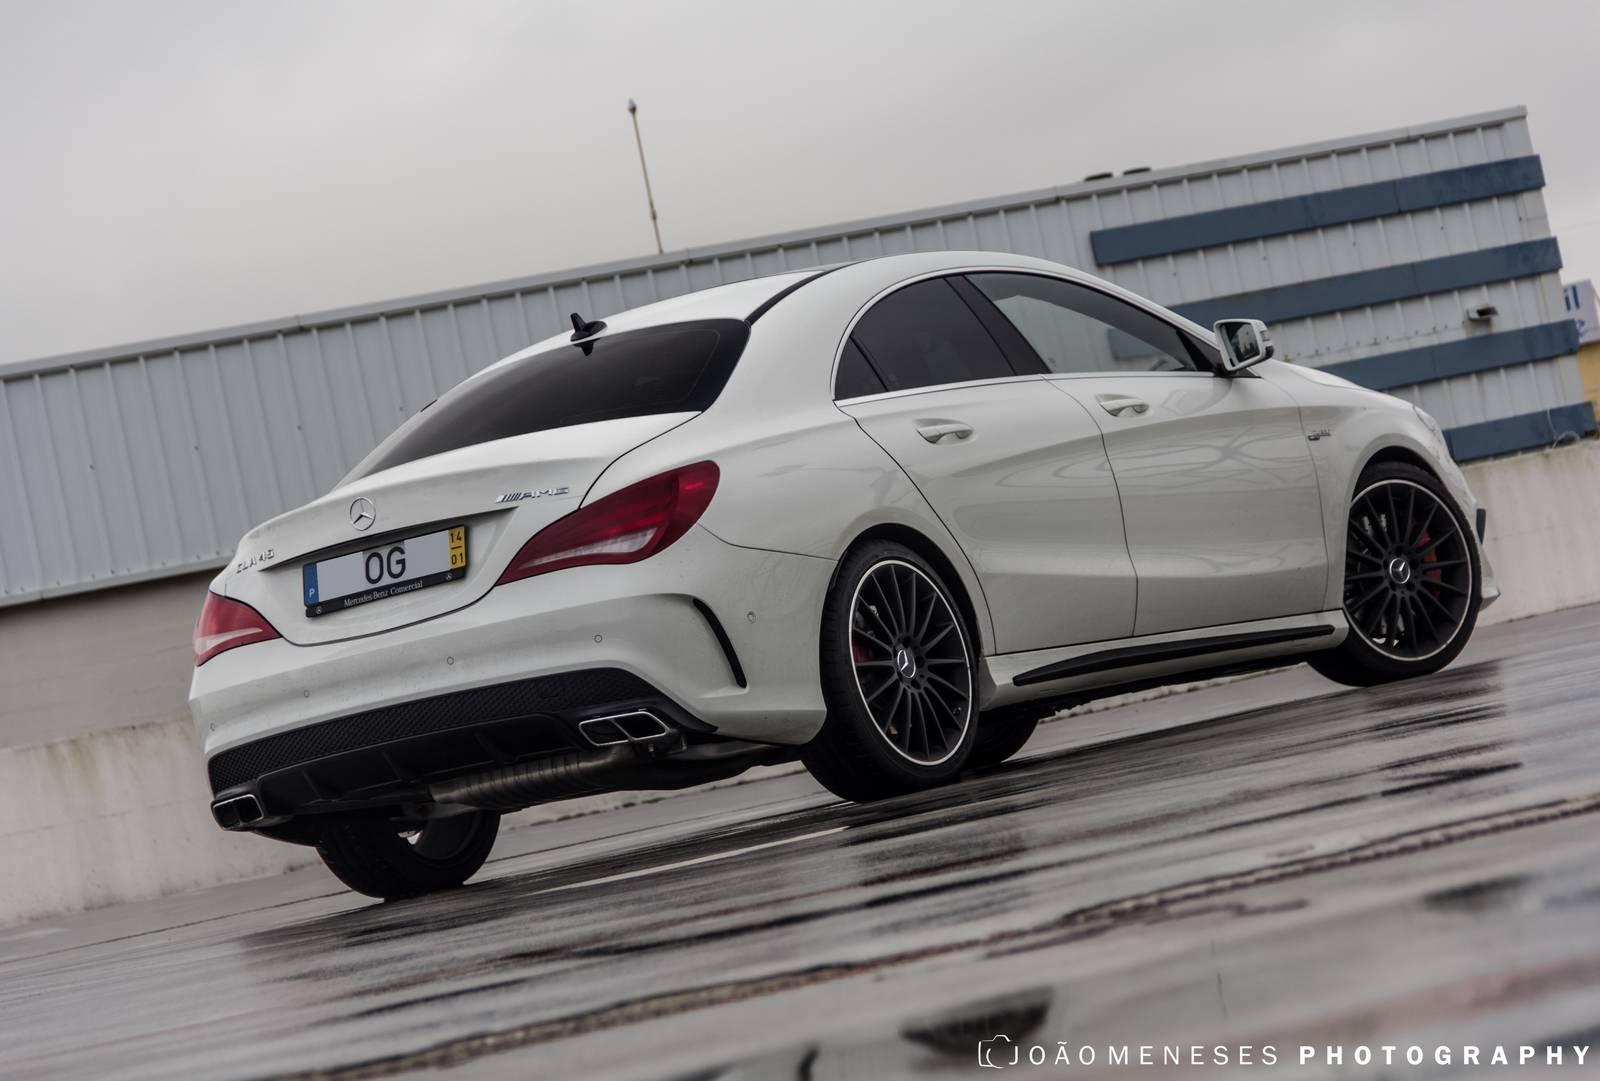 Mercedes Cla 45 Amg For Sale >> 2014 Mercedes-Benz CLA 45 AMG Photoshoot - GTspirit